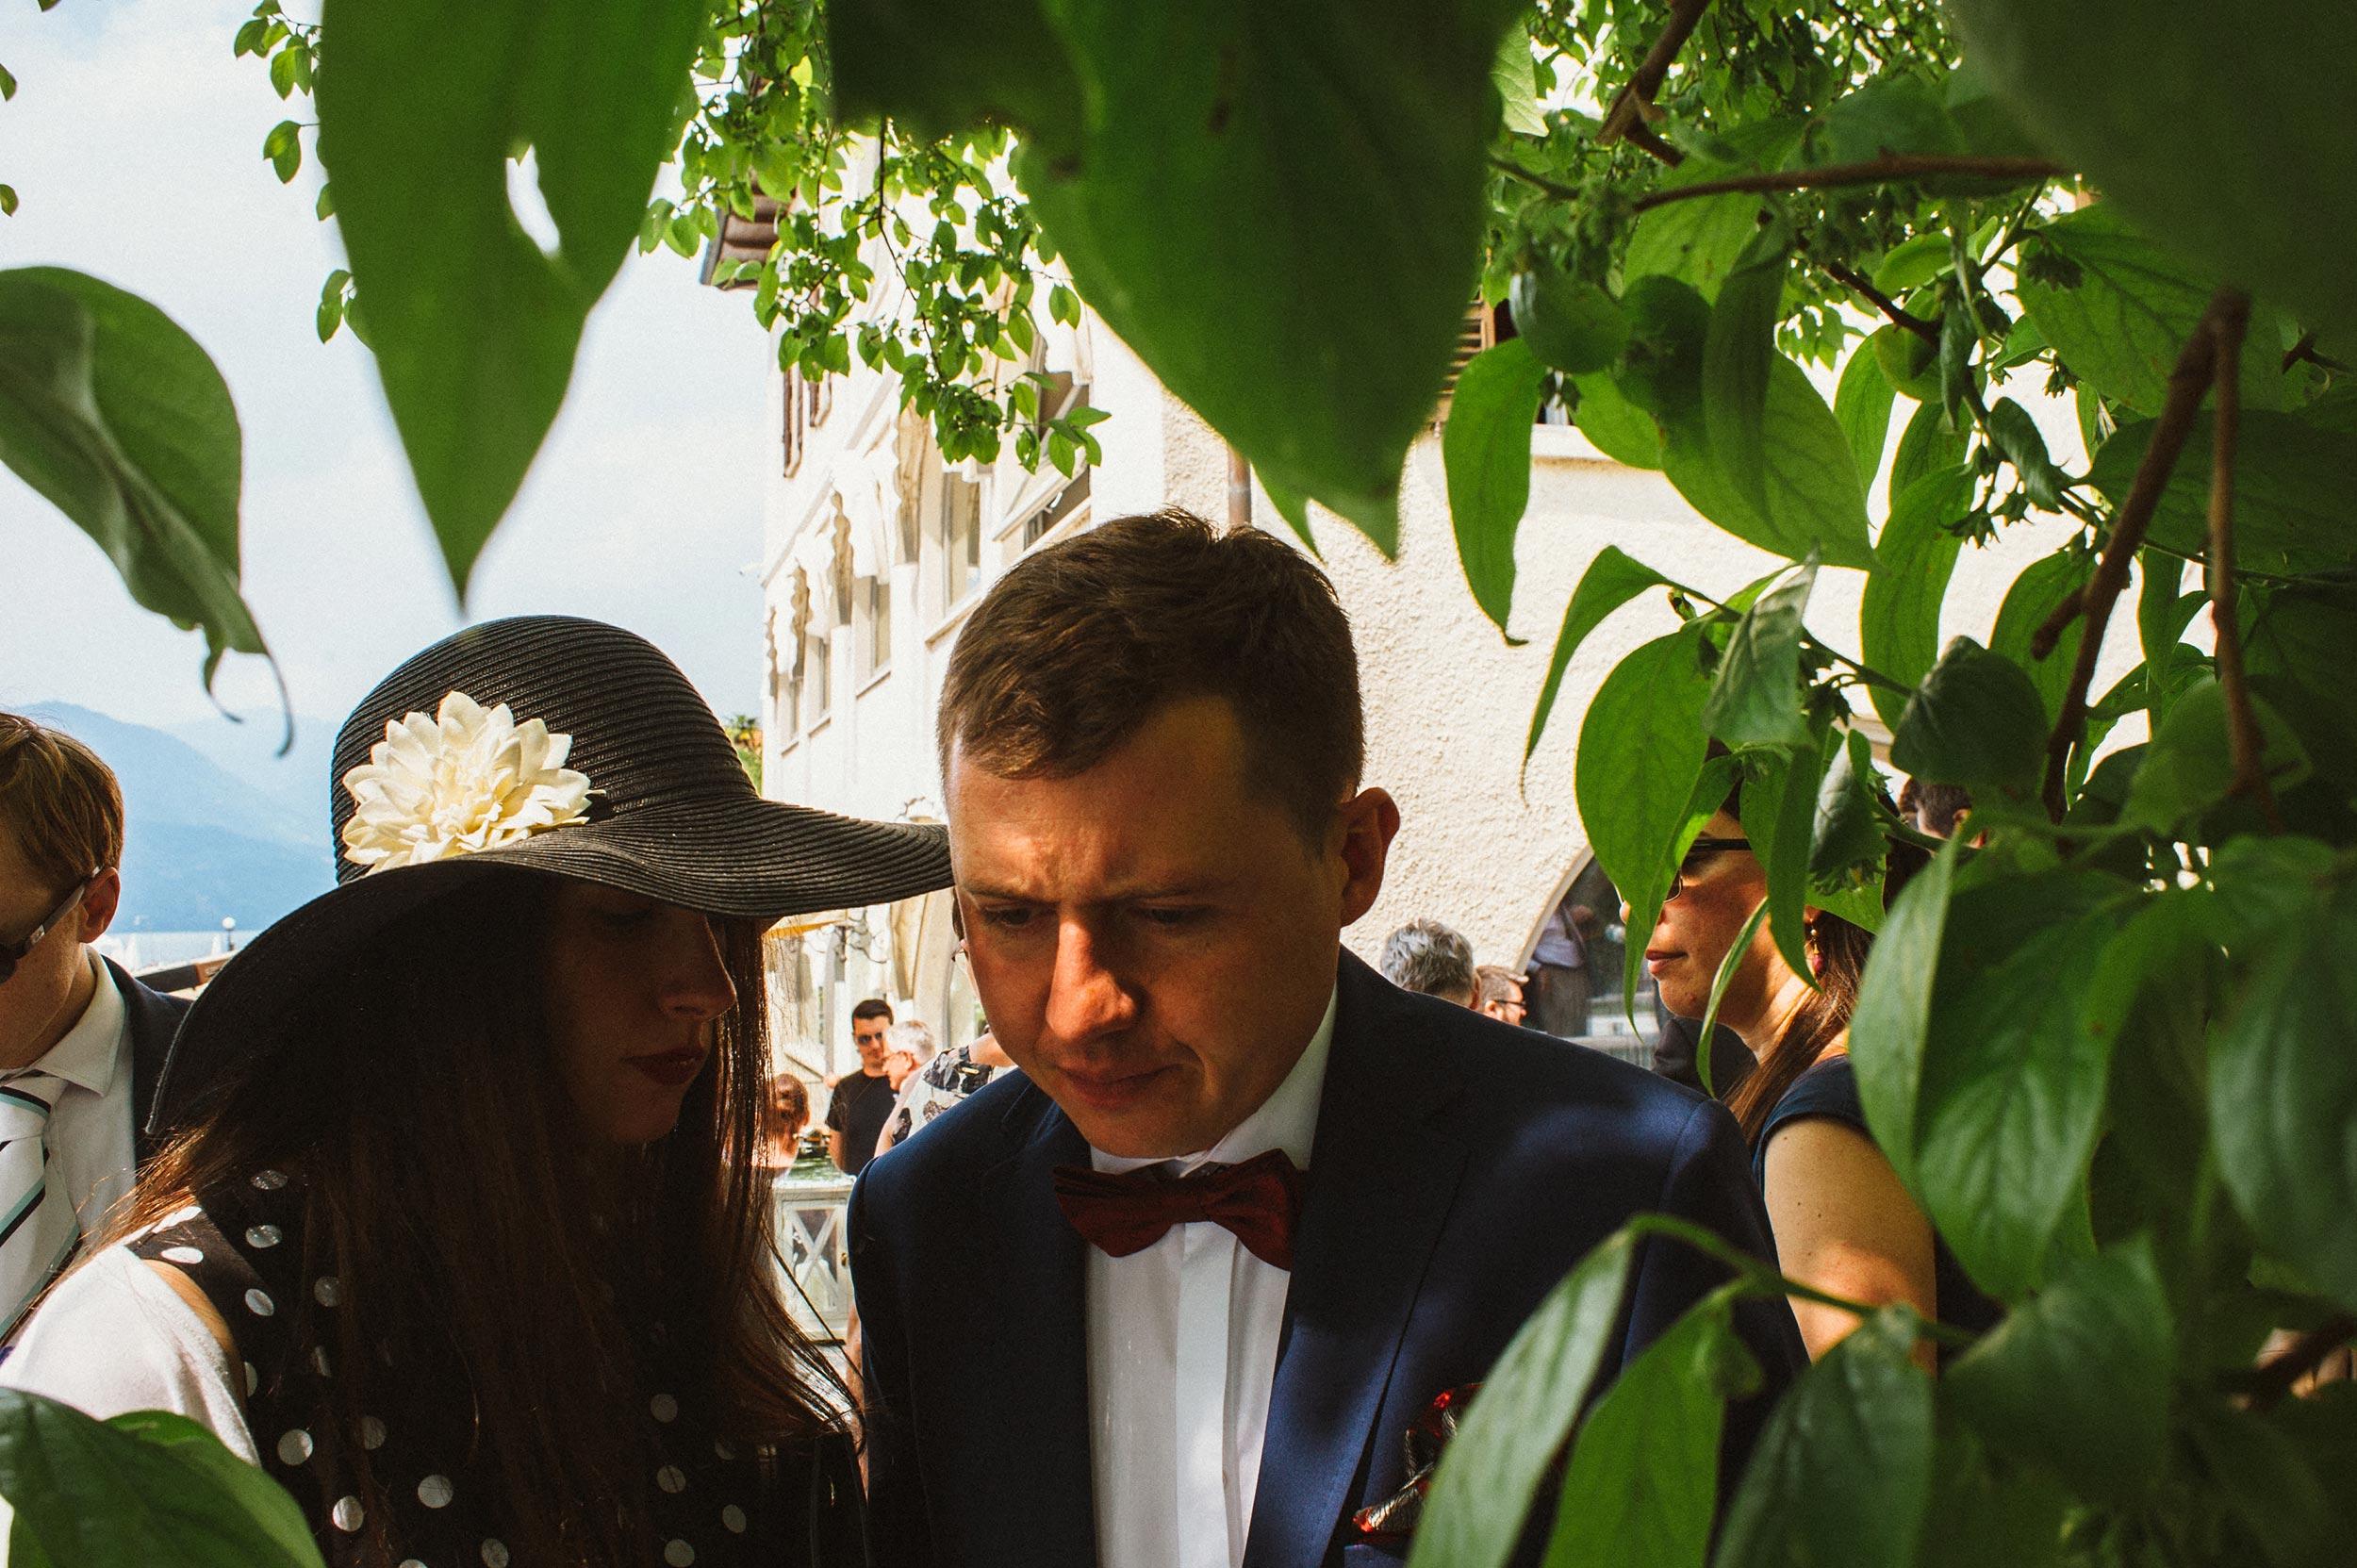 2016-Julius-Silke-Lake-Orta-Wedding-Photographer-Italy-Alessandro-Avenali-70.jpg